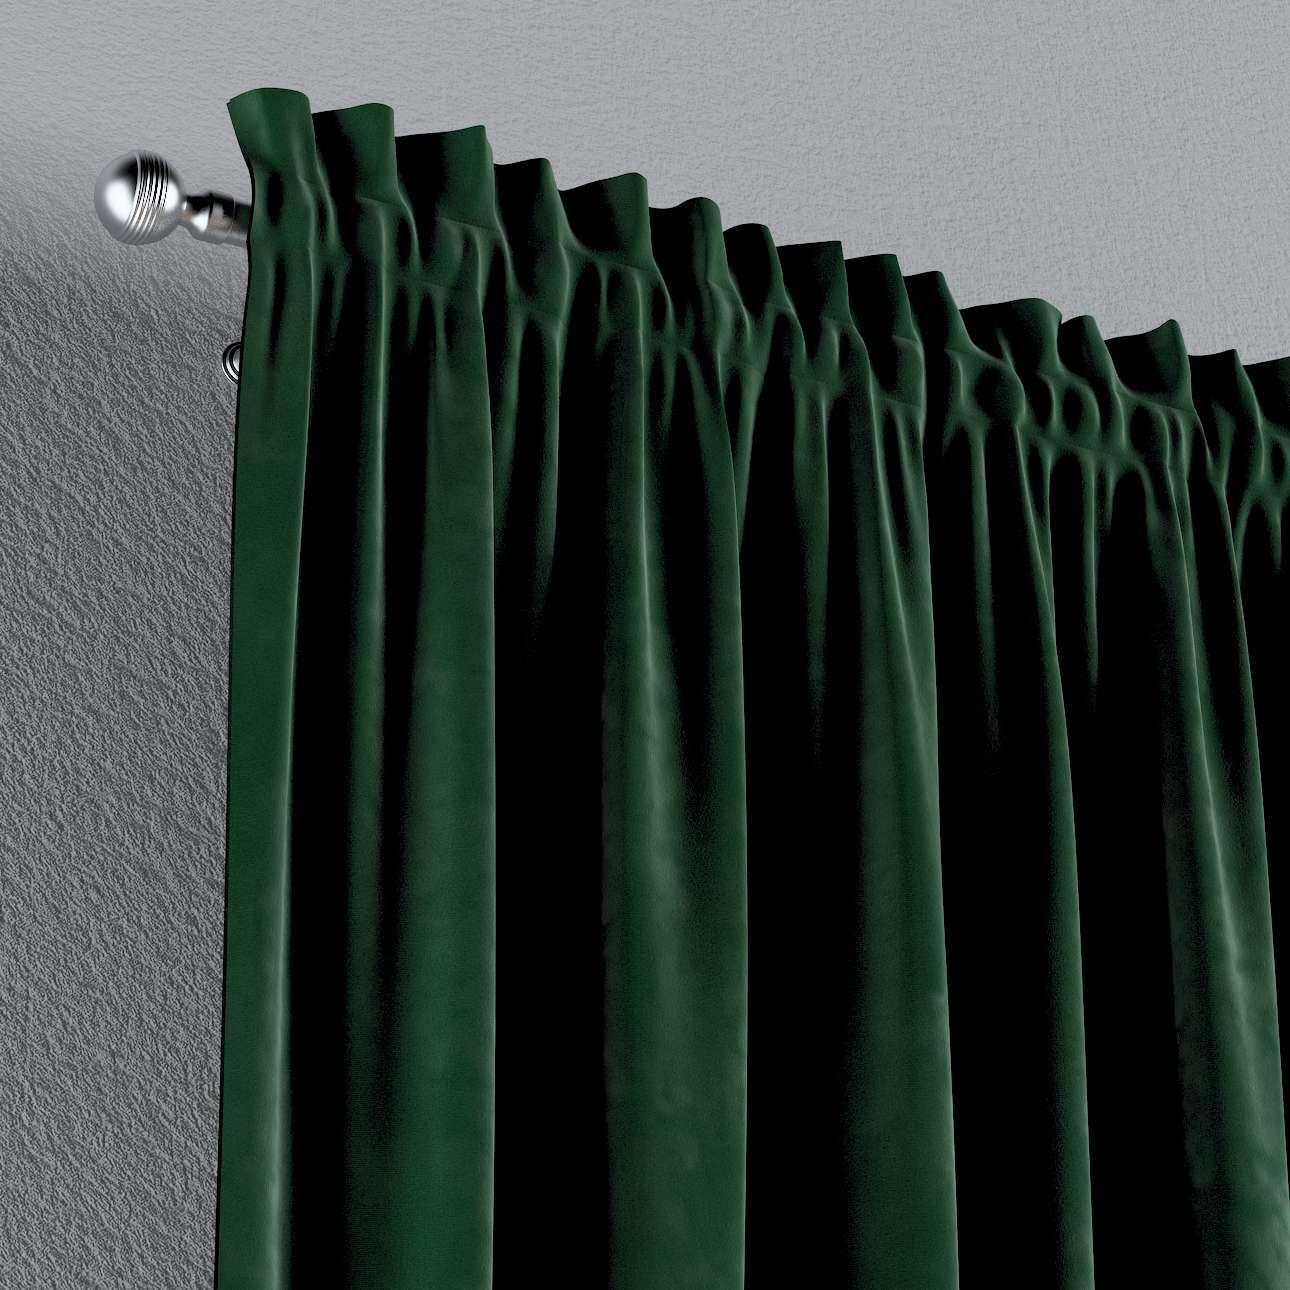 Závěs s tunýlkem a volánkem 130 x 260 cm v kolekci Velvet, látka: 704-13